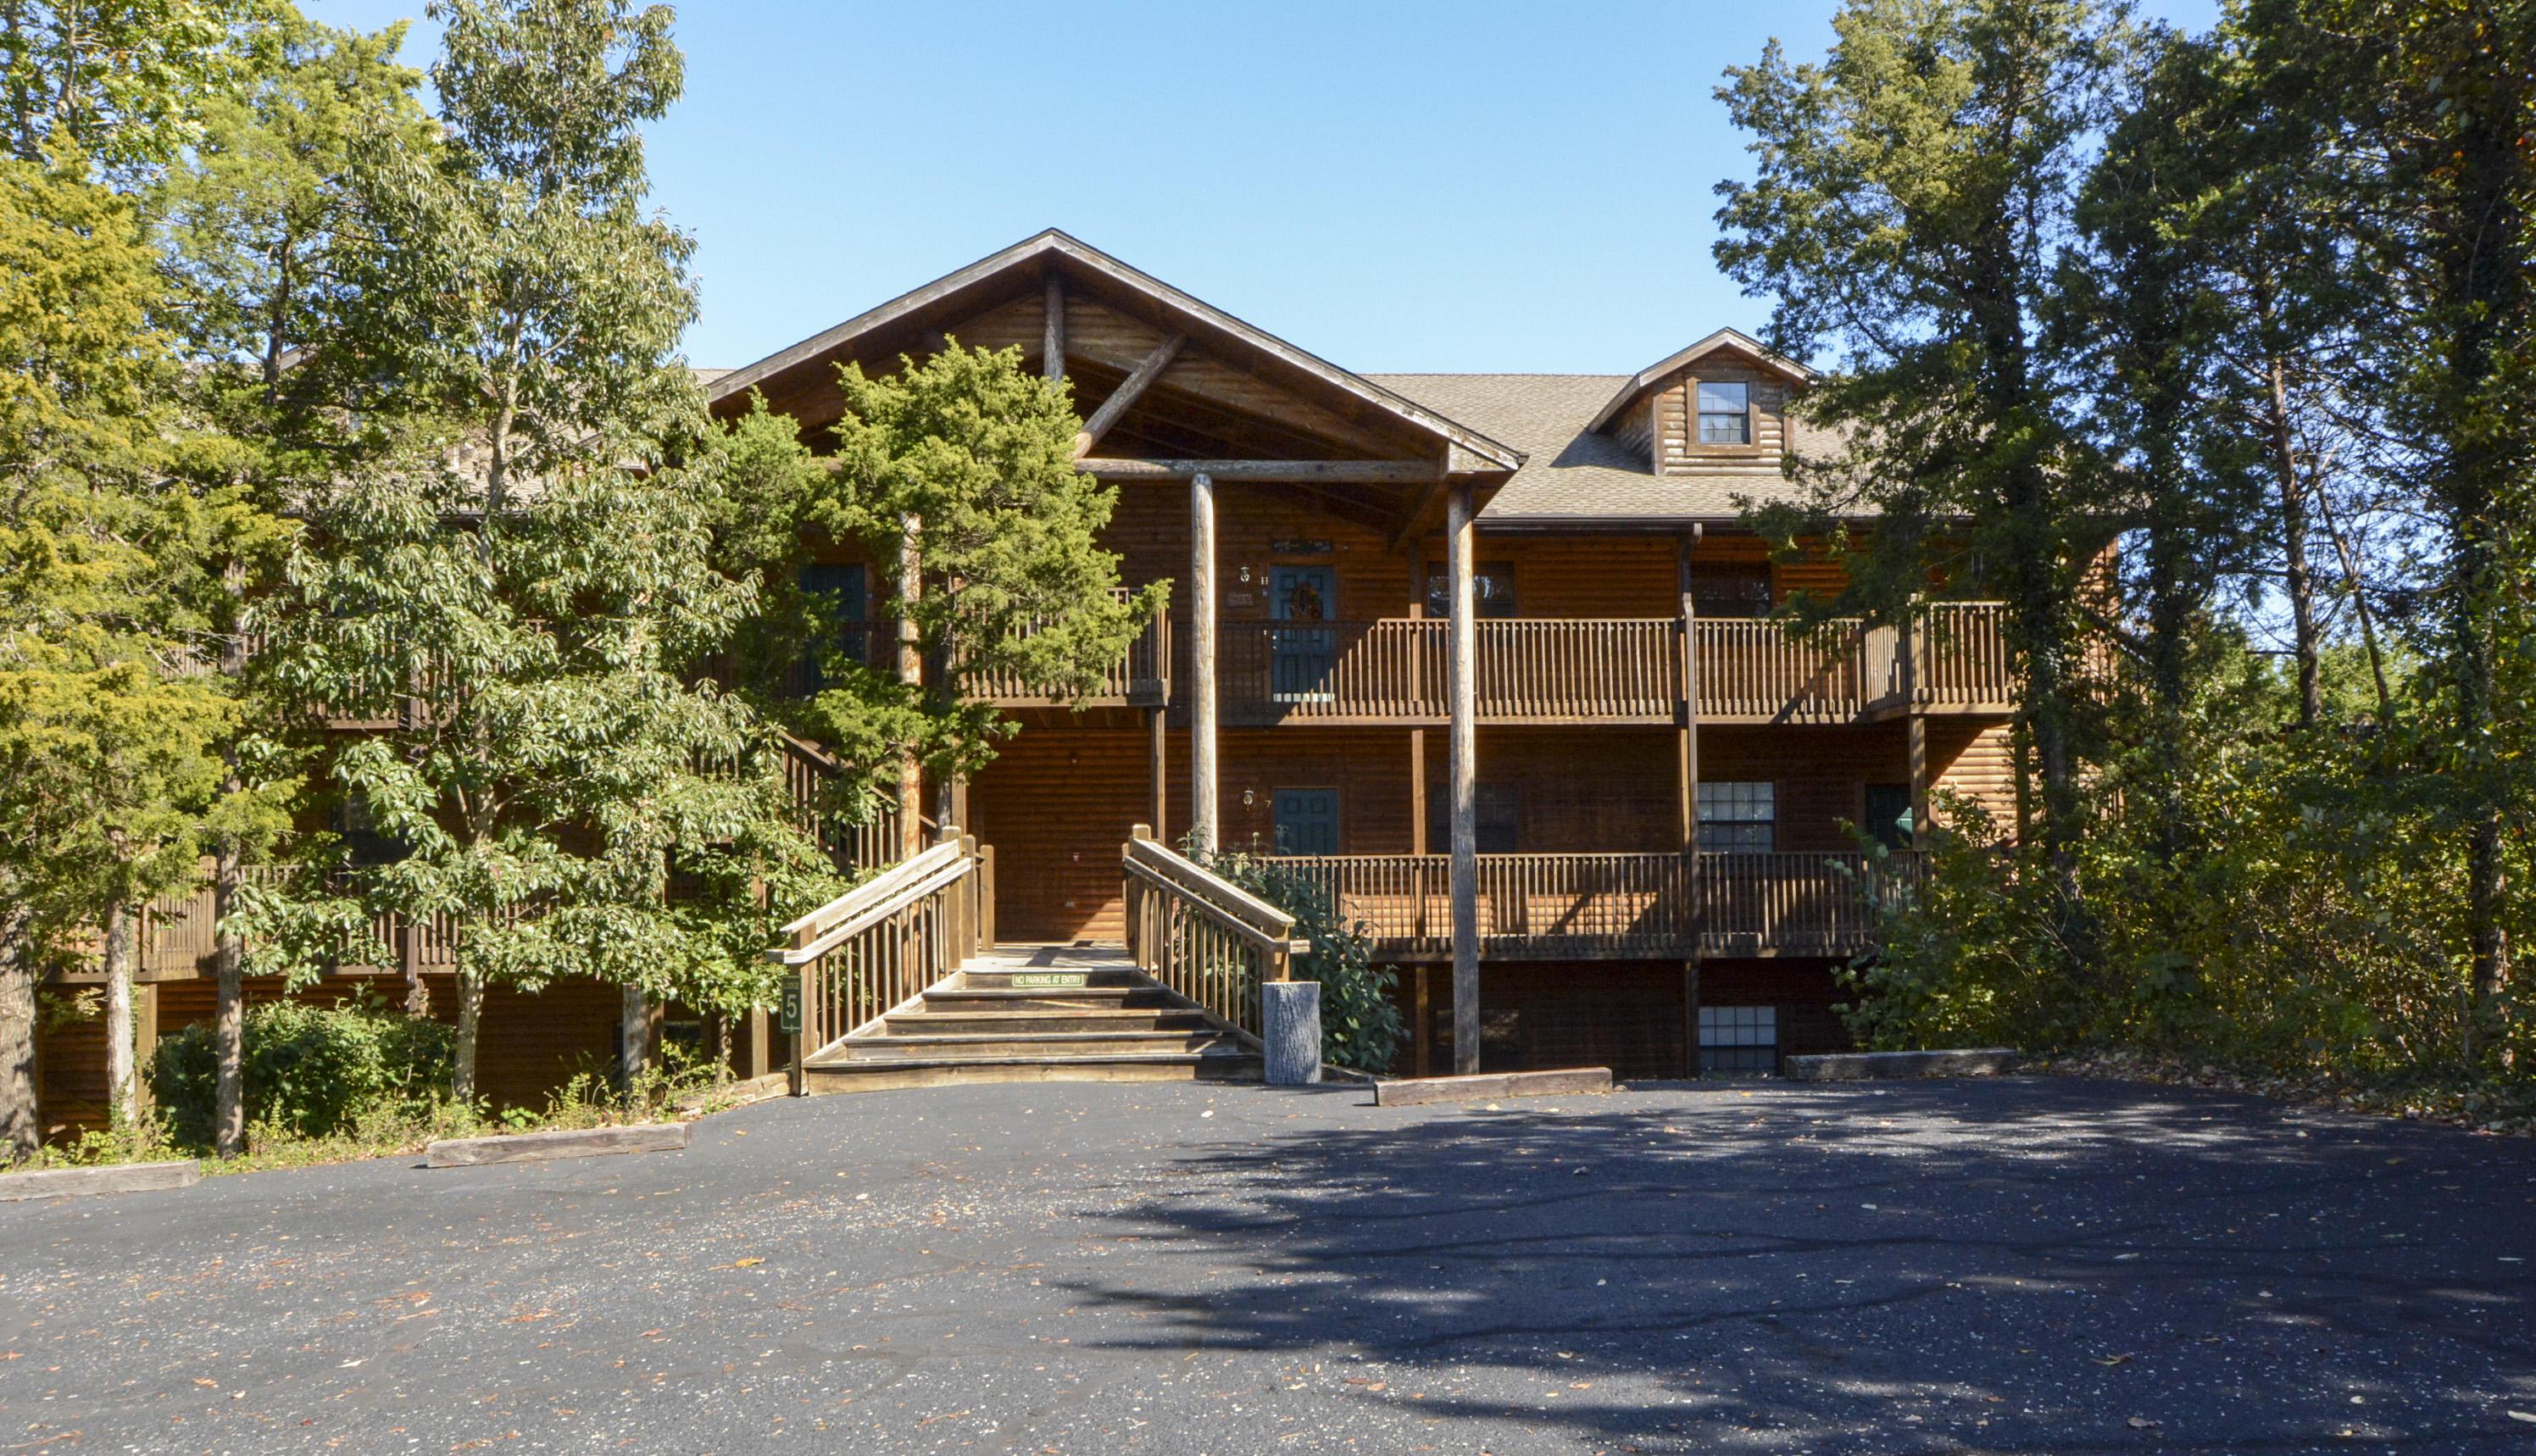 24 Village Trail #5 Branson, MO 65616